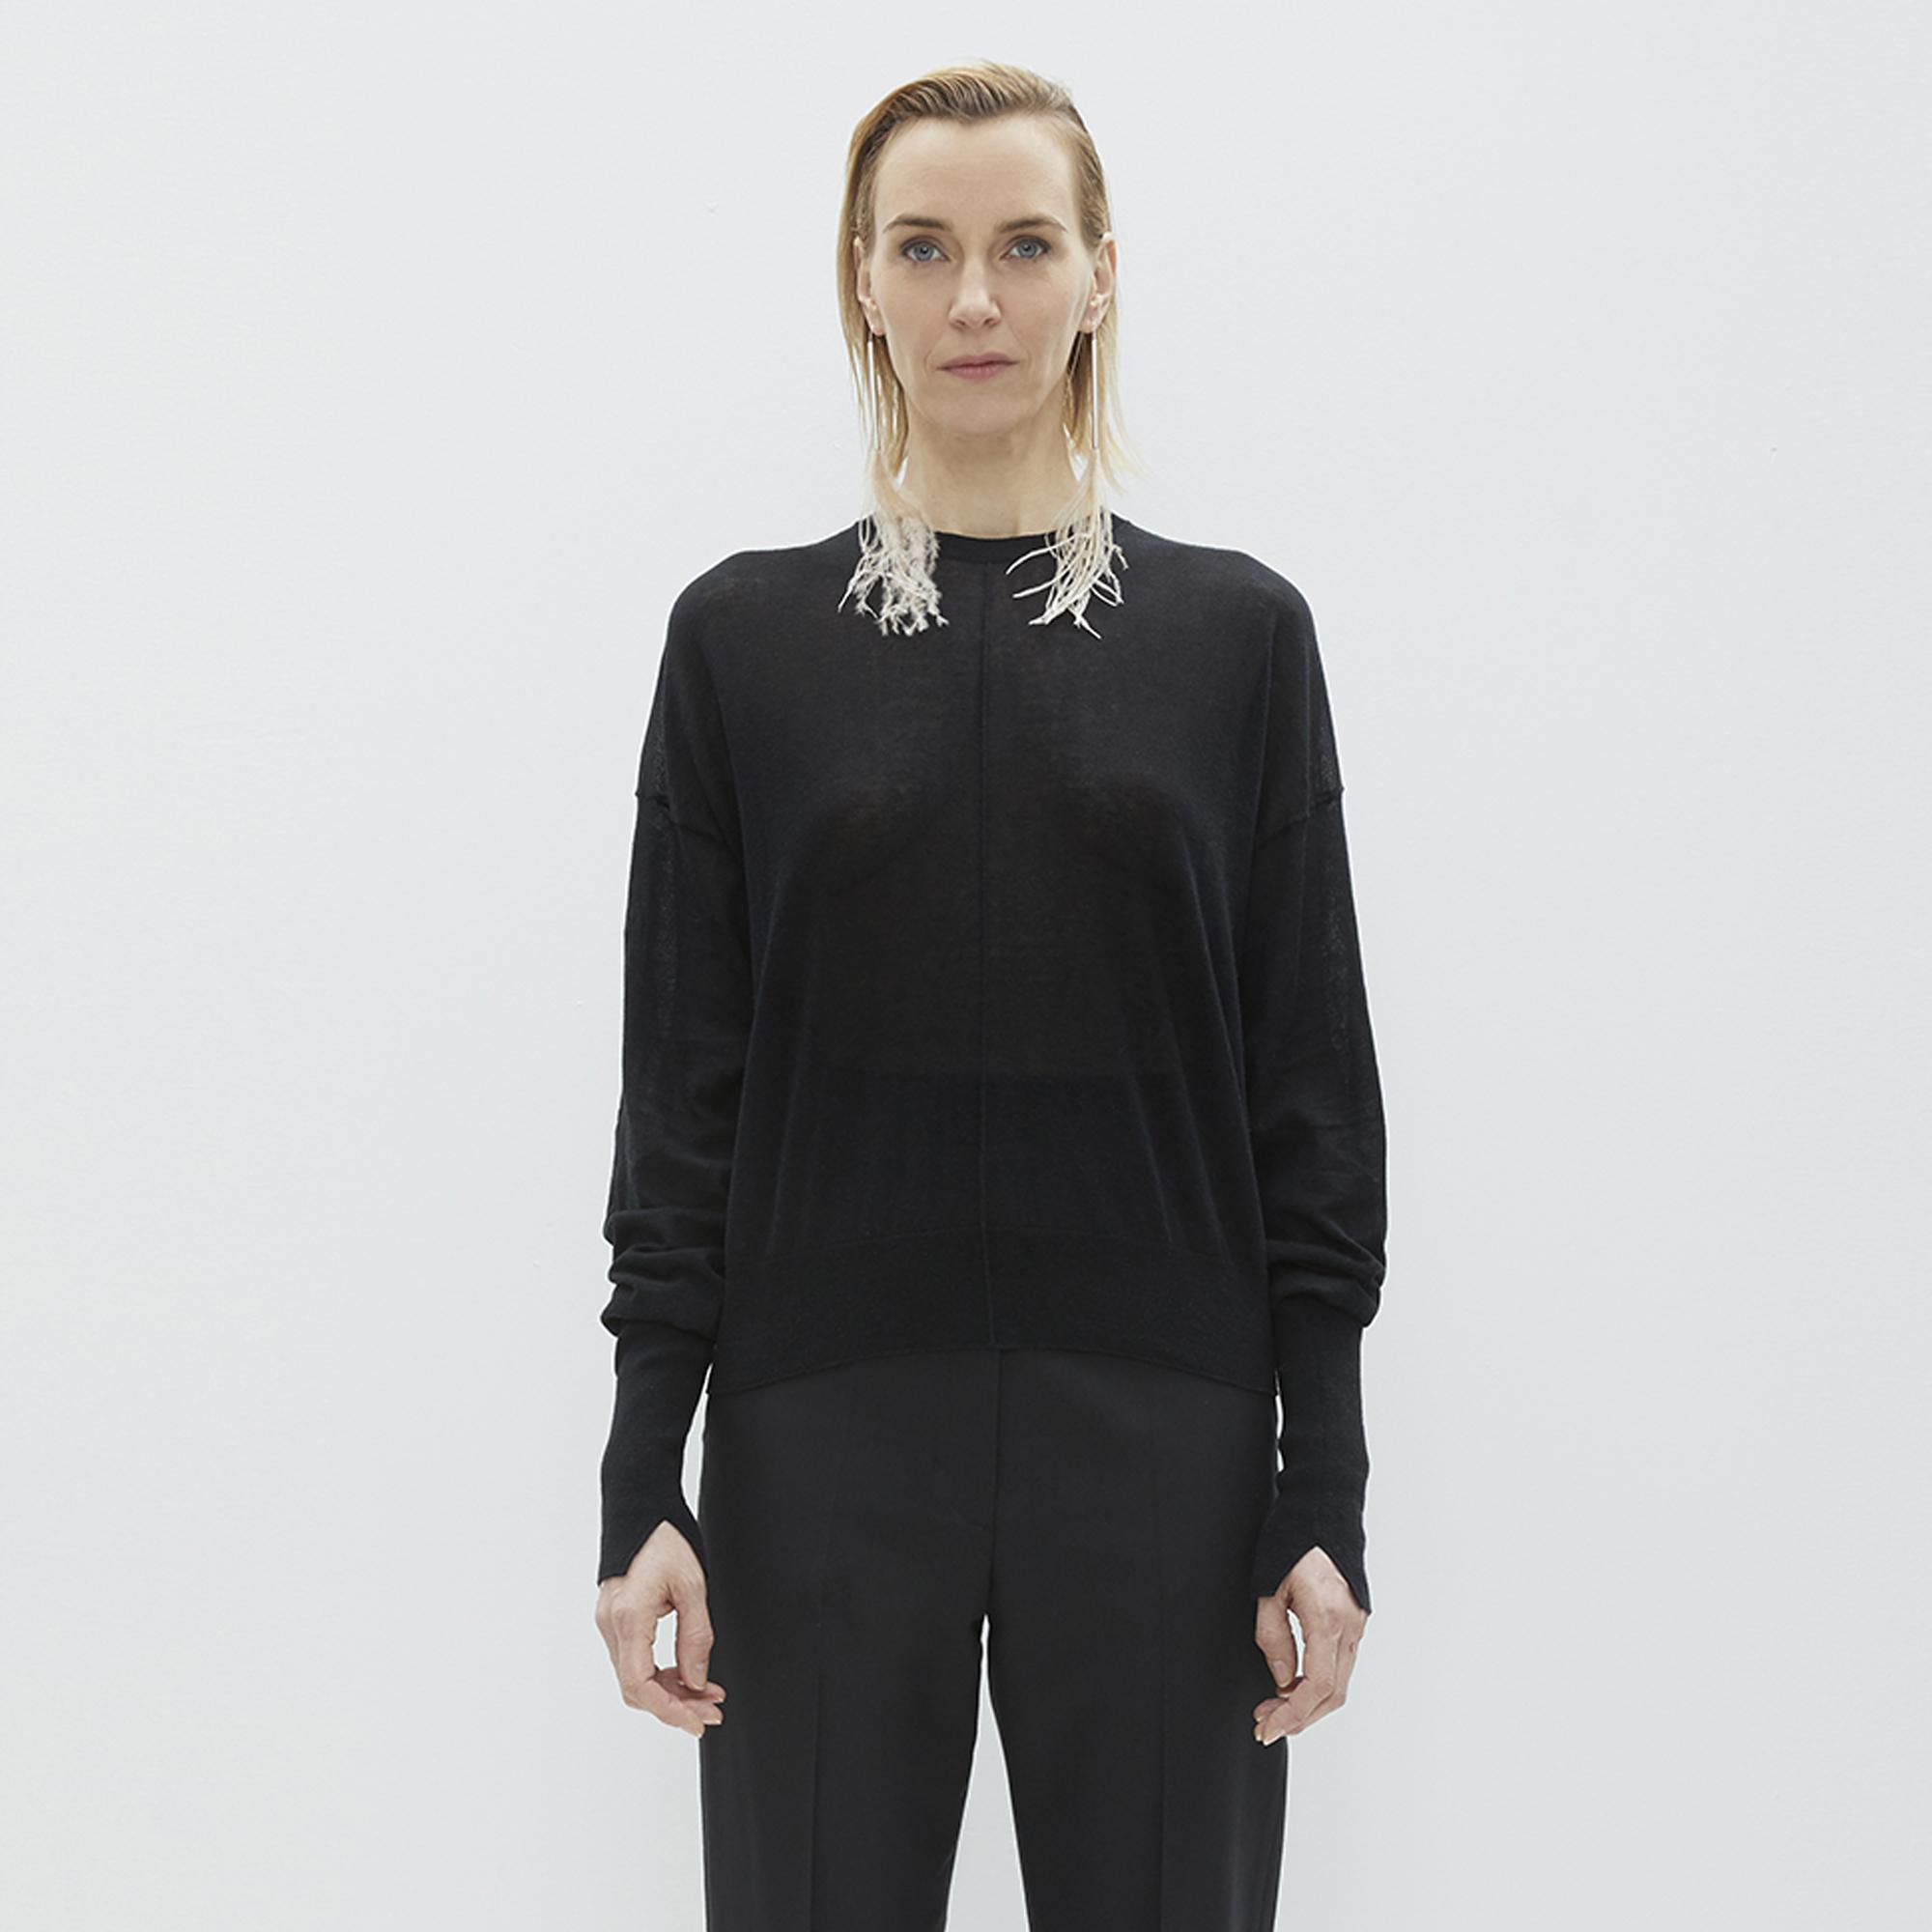 eeeb034a9 Helmut Lang Black Folded Sheer Crewneck Sweater